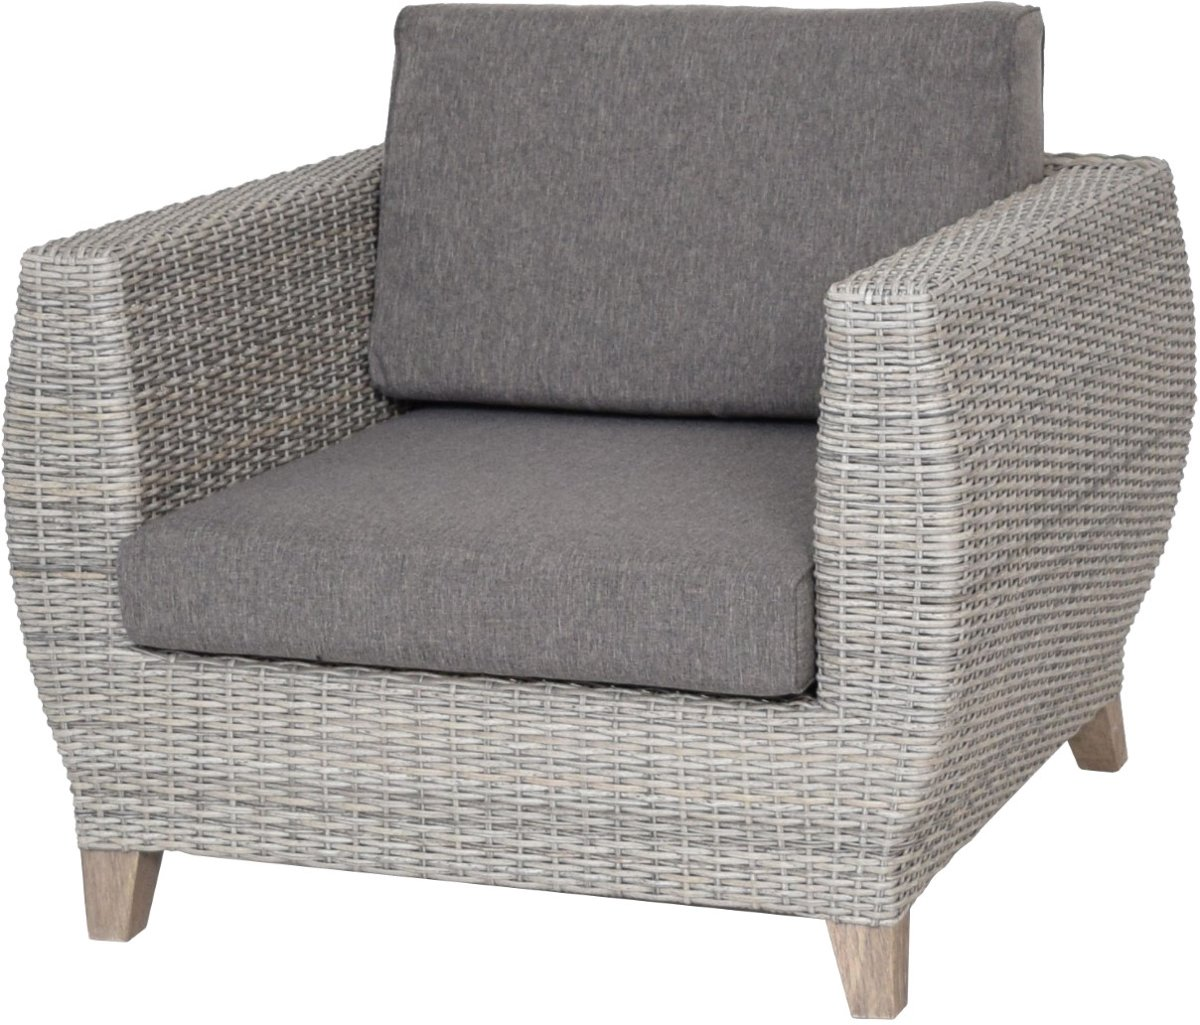 Mairo Lounge Chair Weathered Grey kopen